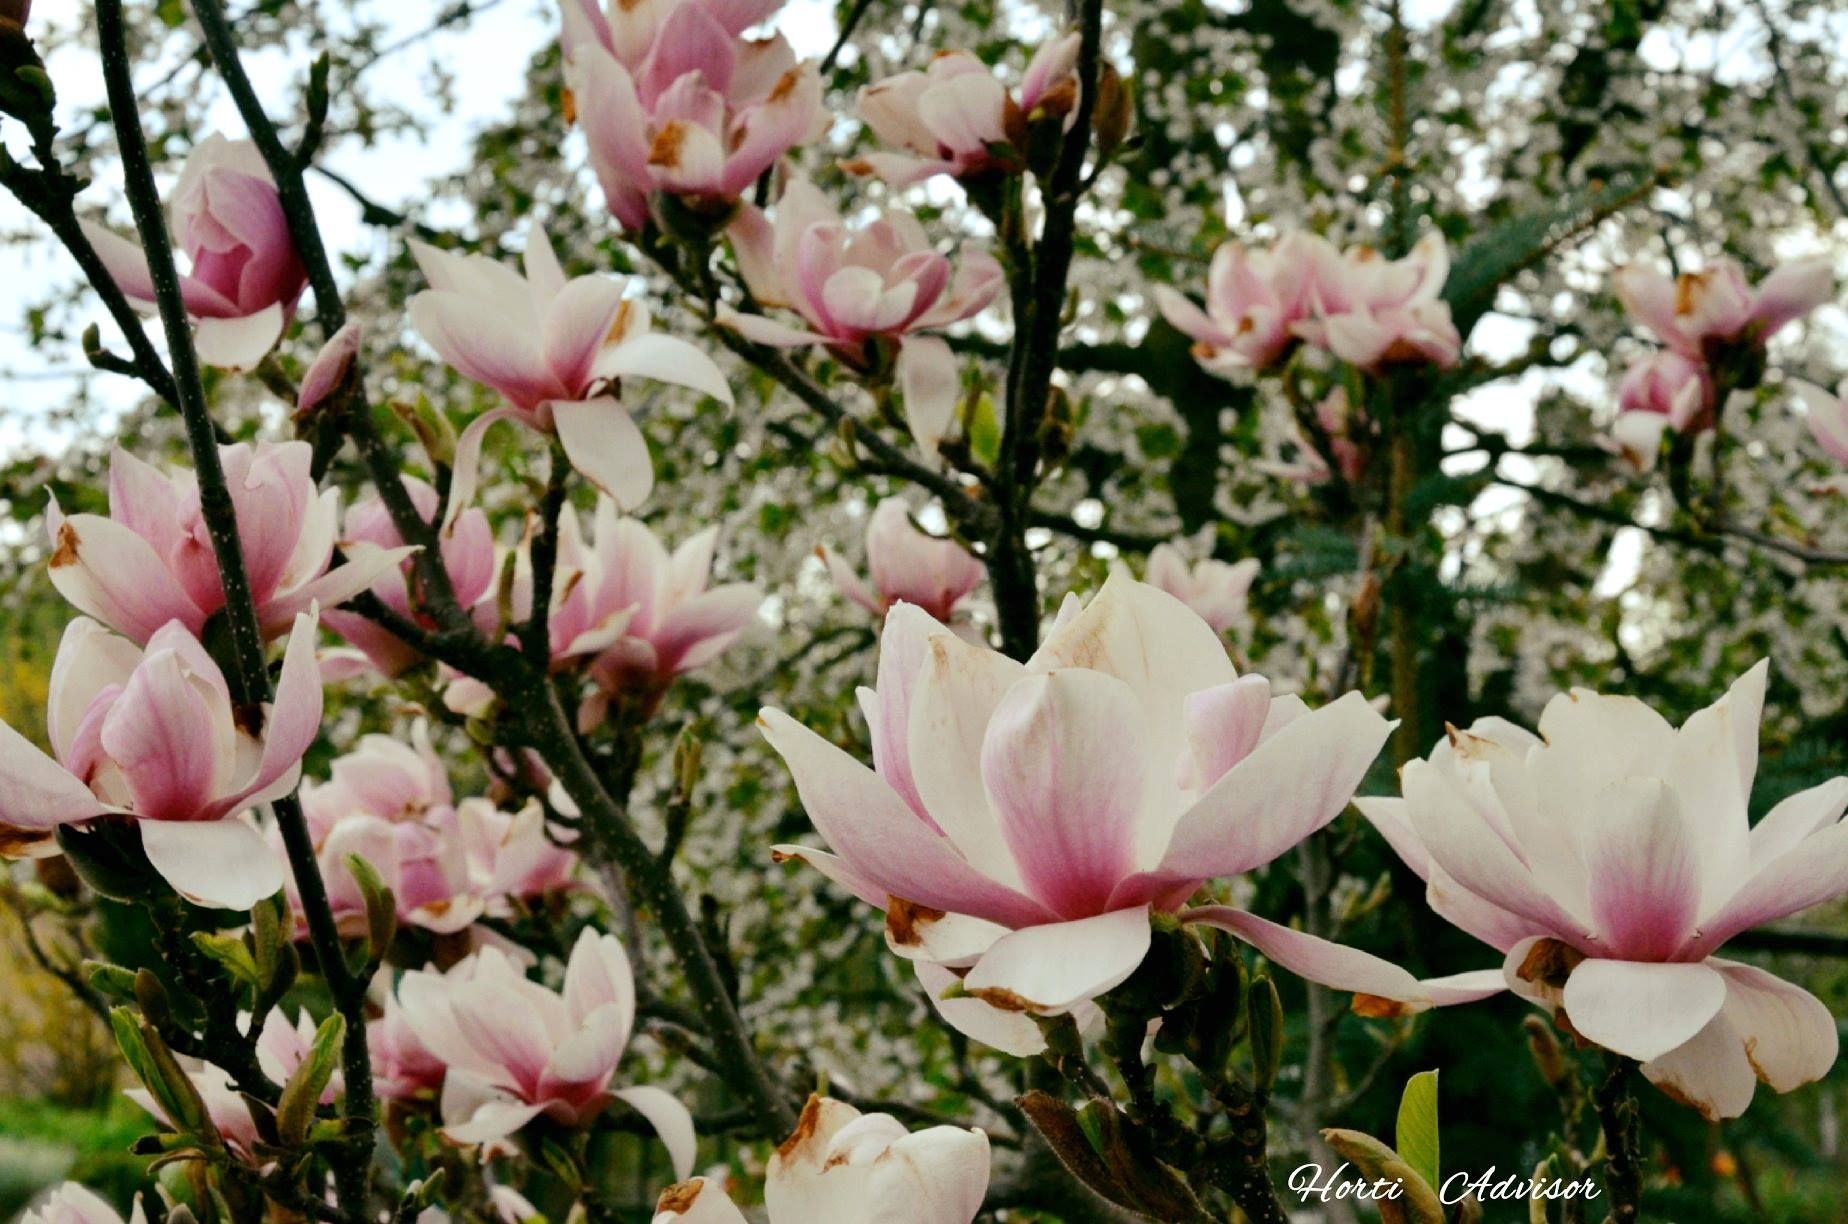 Magnolia In 2020 Plants Garden Design Magnolia